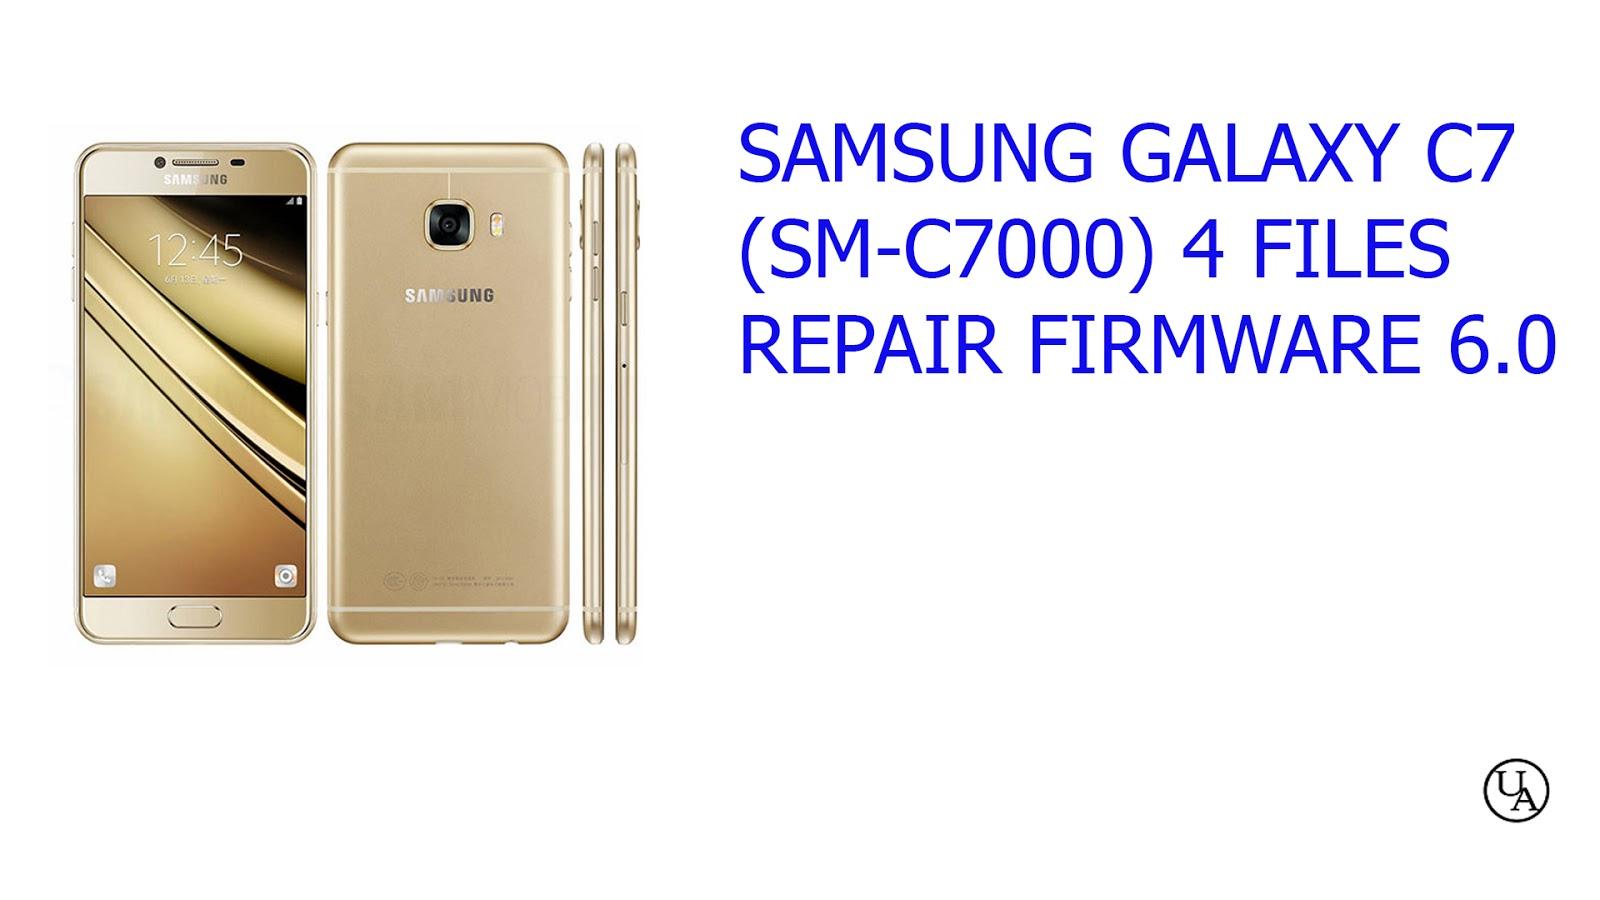 Gsmworld : SAMSUNG GALAXY C7 (SM-C7000) 4 FILES REPAIR